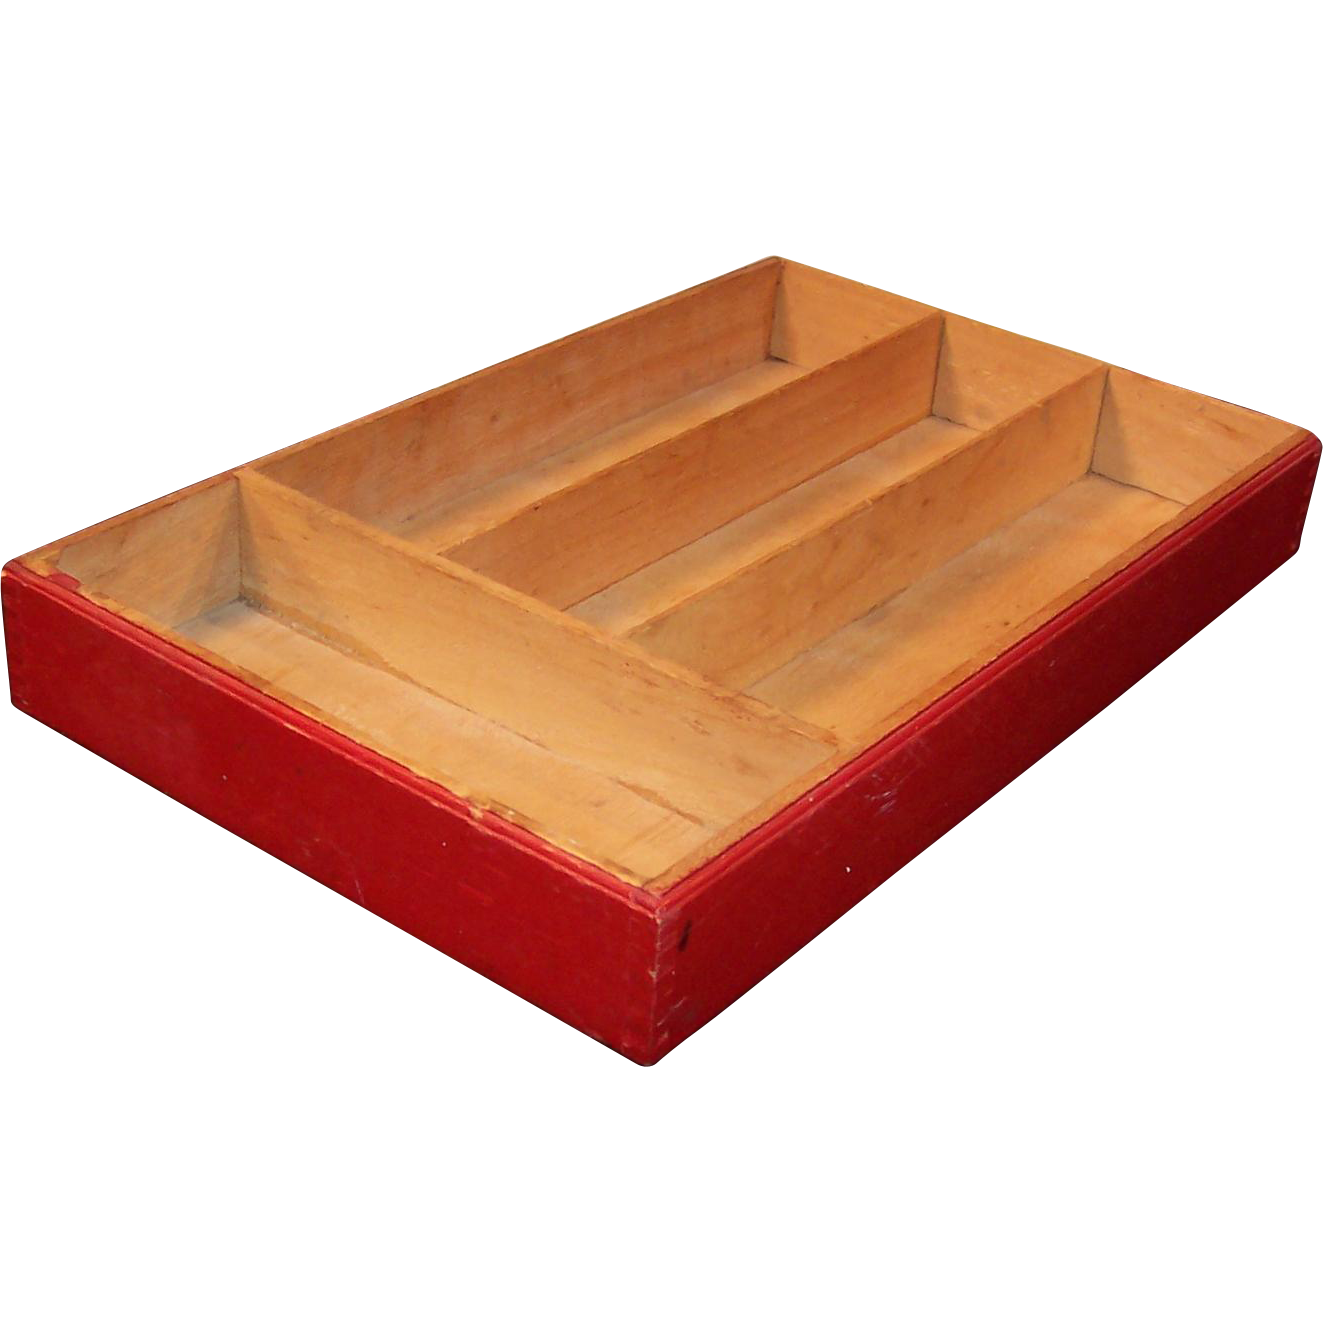 Wood Cutlery or Flatware Utensil Tray